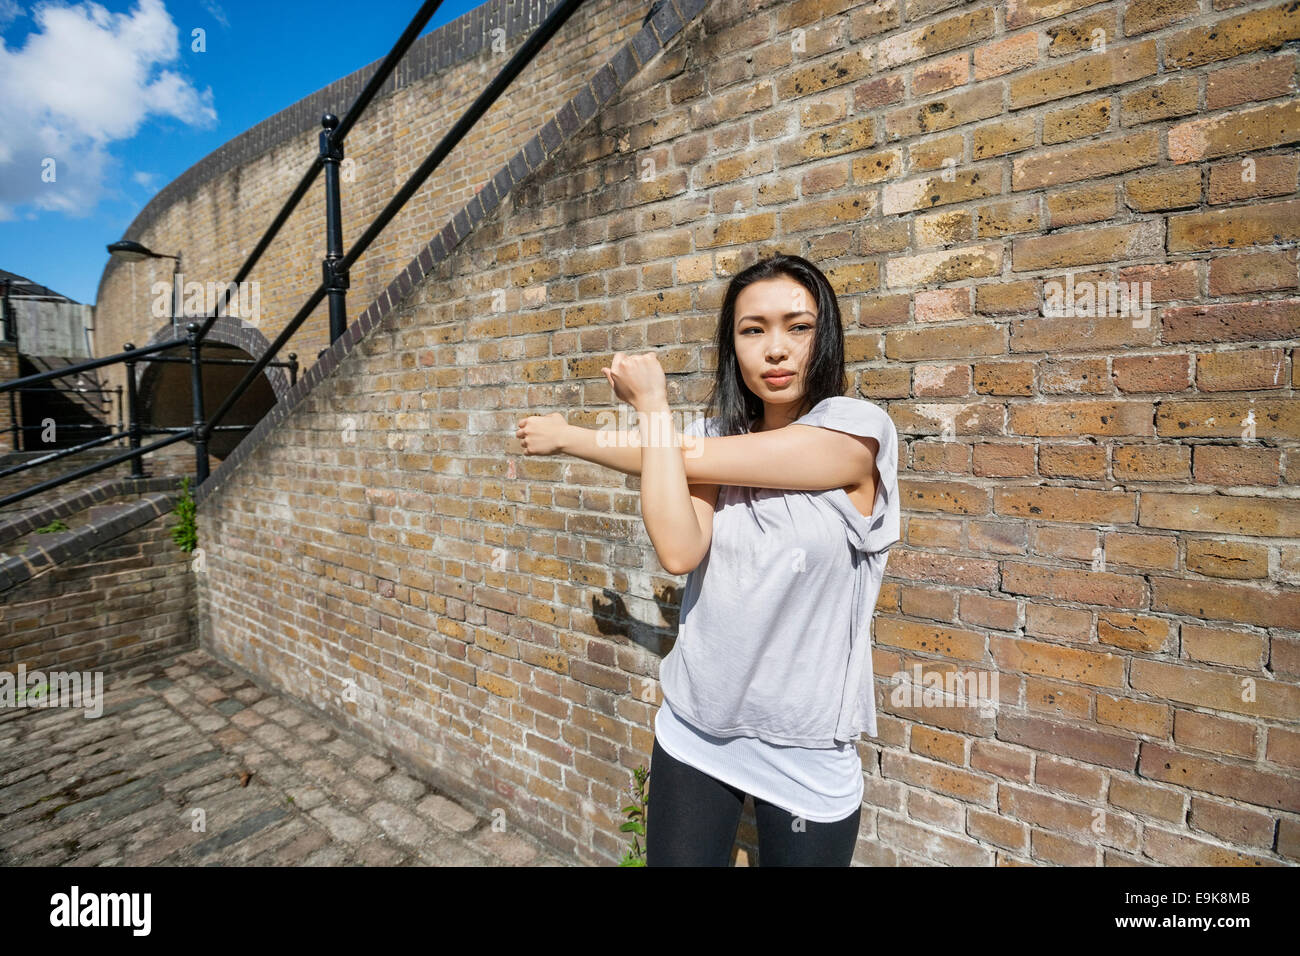 Fit Woman with Ausübung gegen Mauer Stockbild